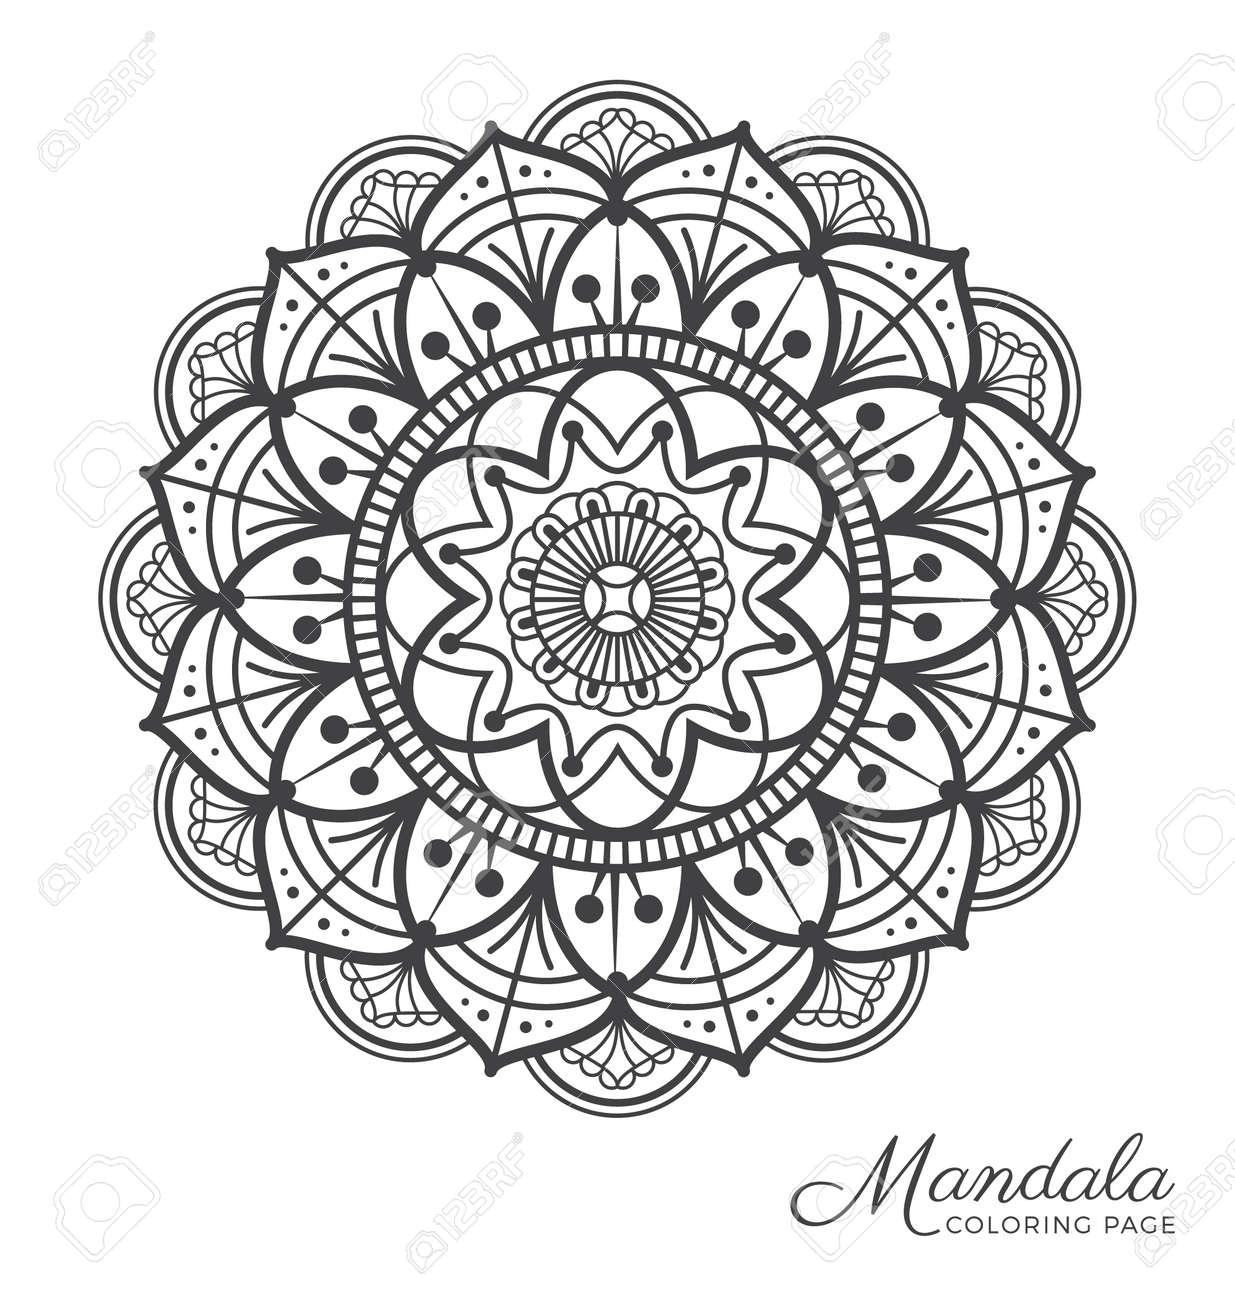 Tibetan Mandala Decorative Ornament Design For Adult Coloring